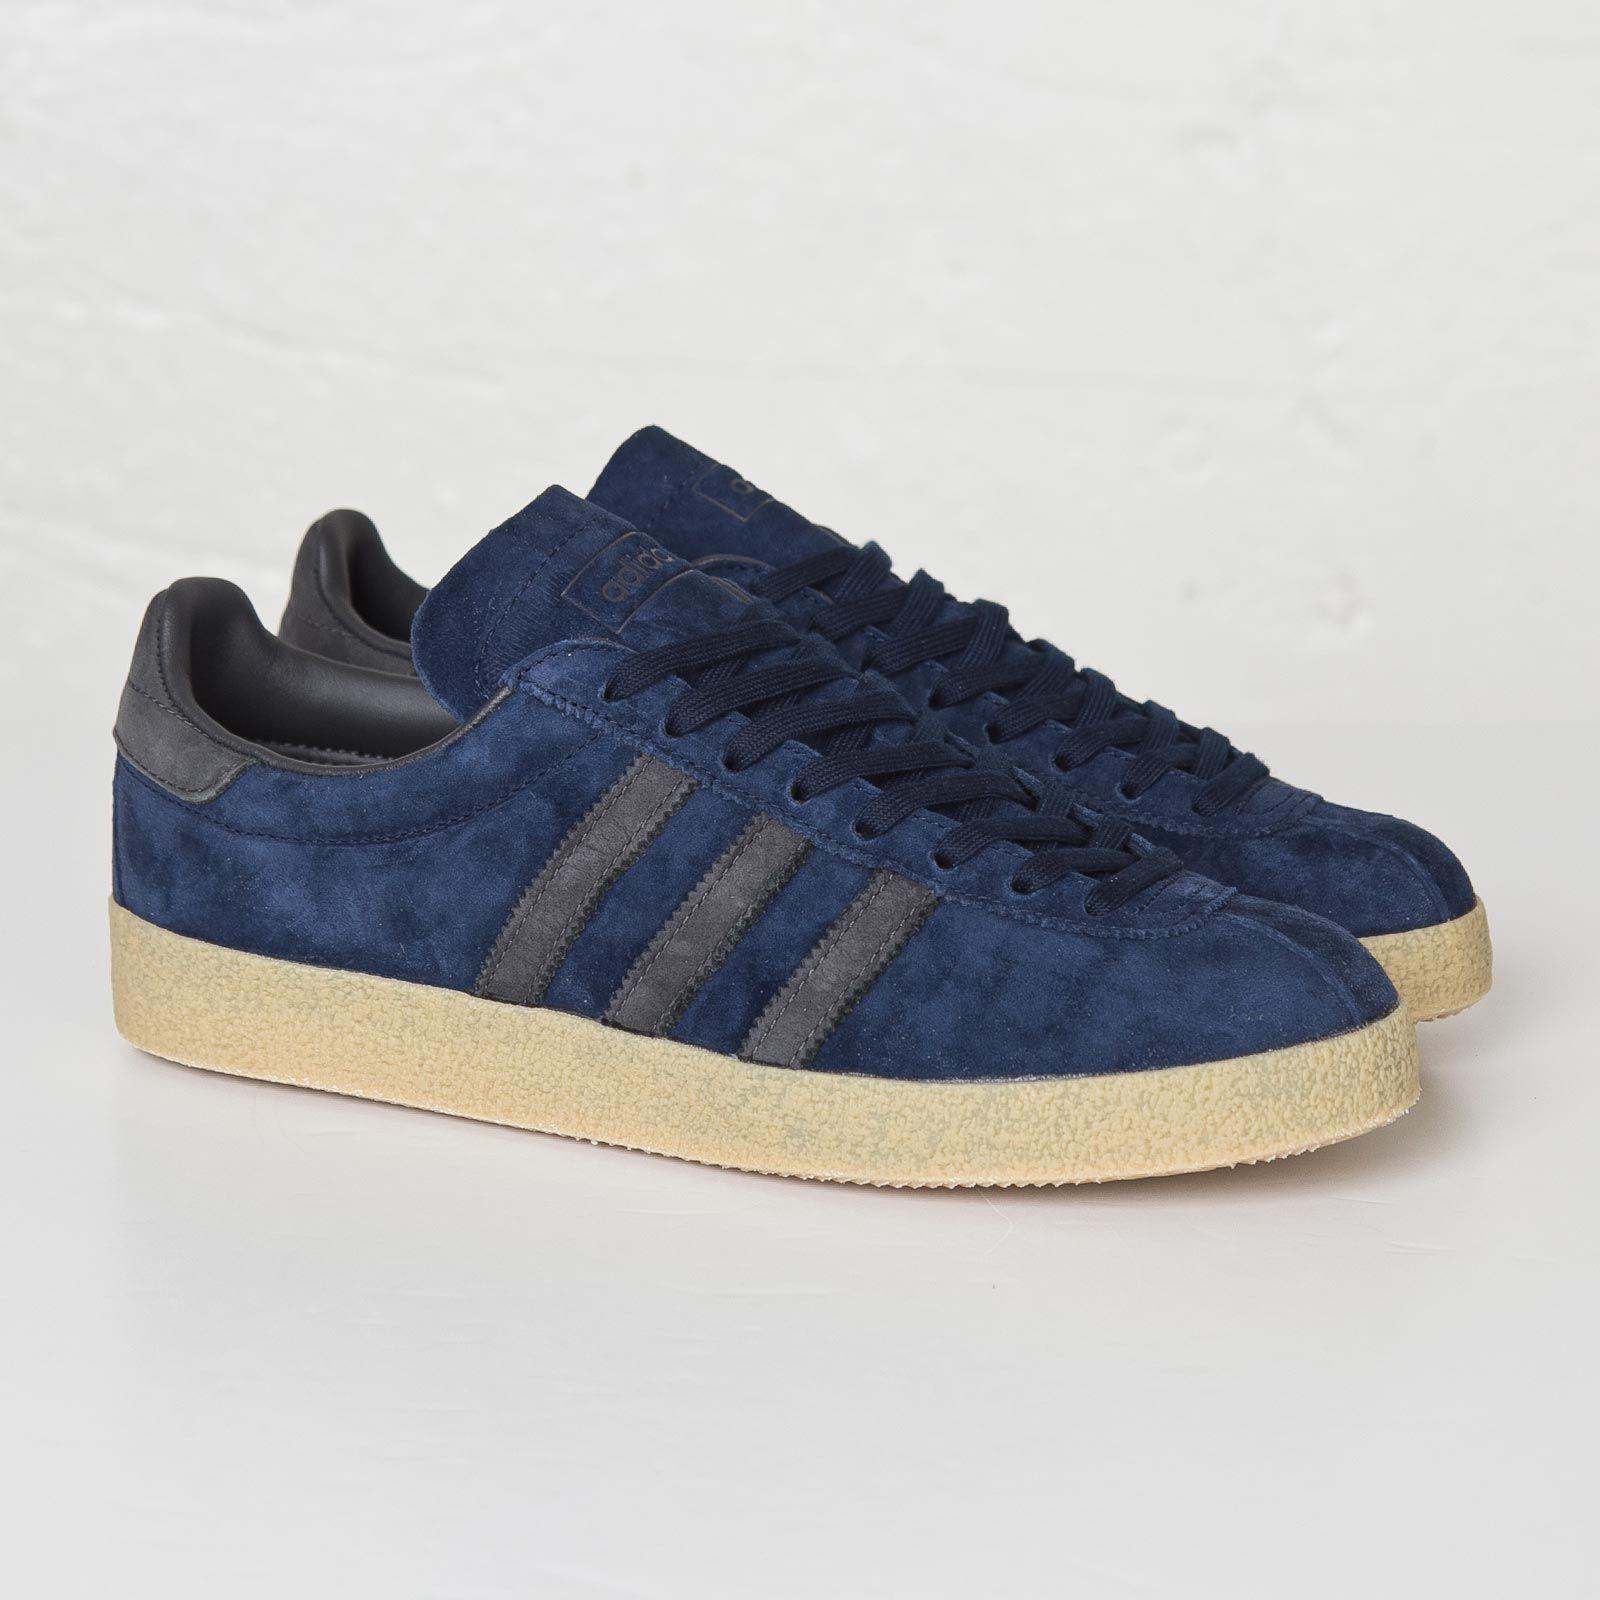 good price Adidas Topanga Shoes Yellow Blue | Adidas